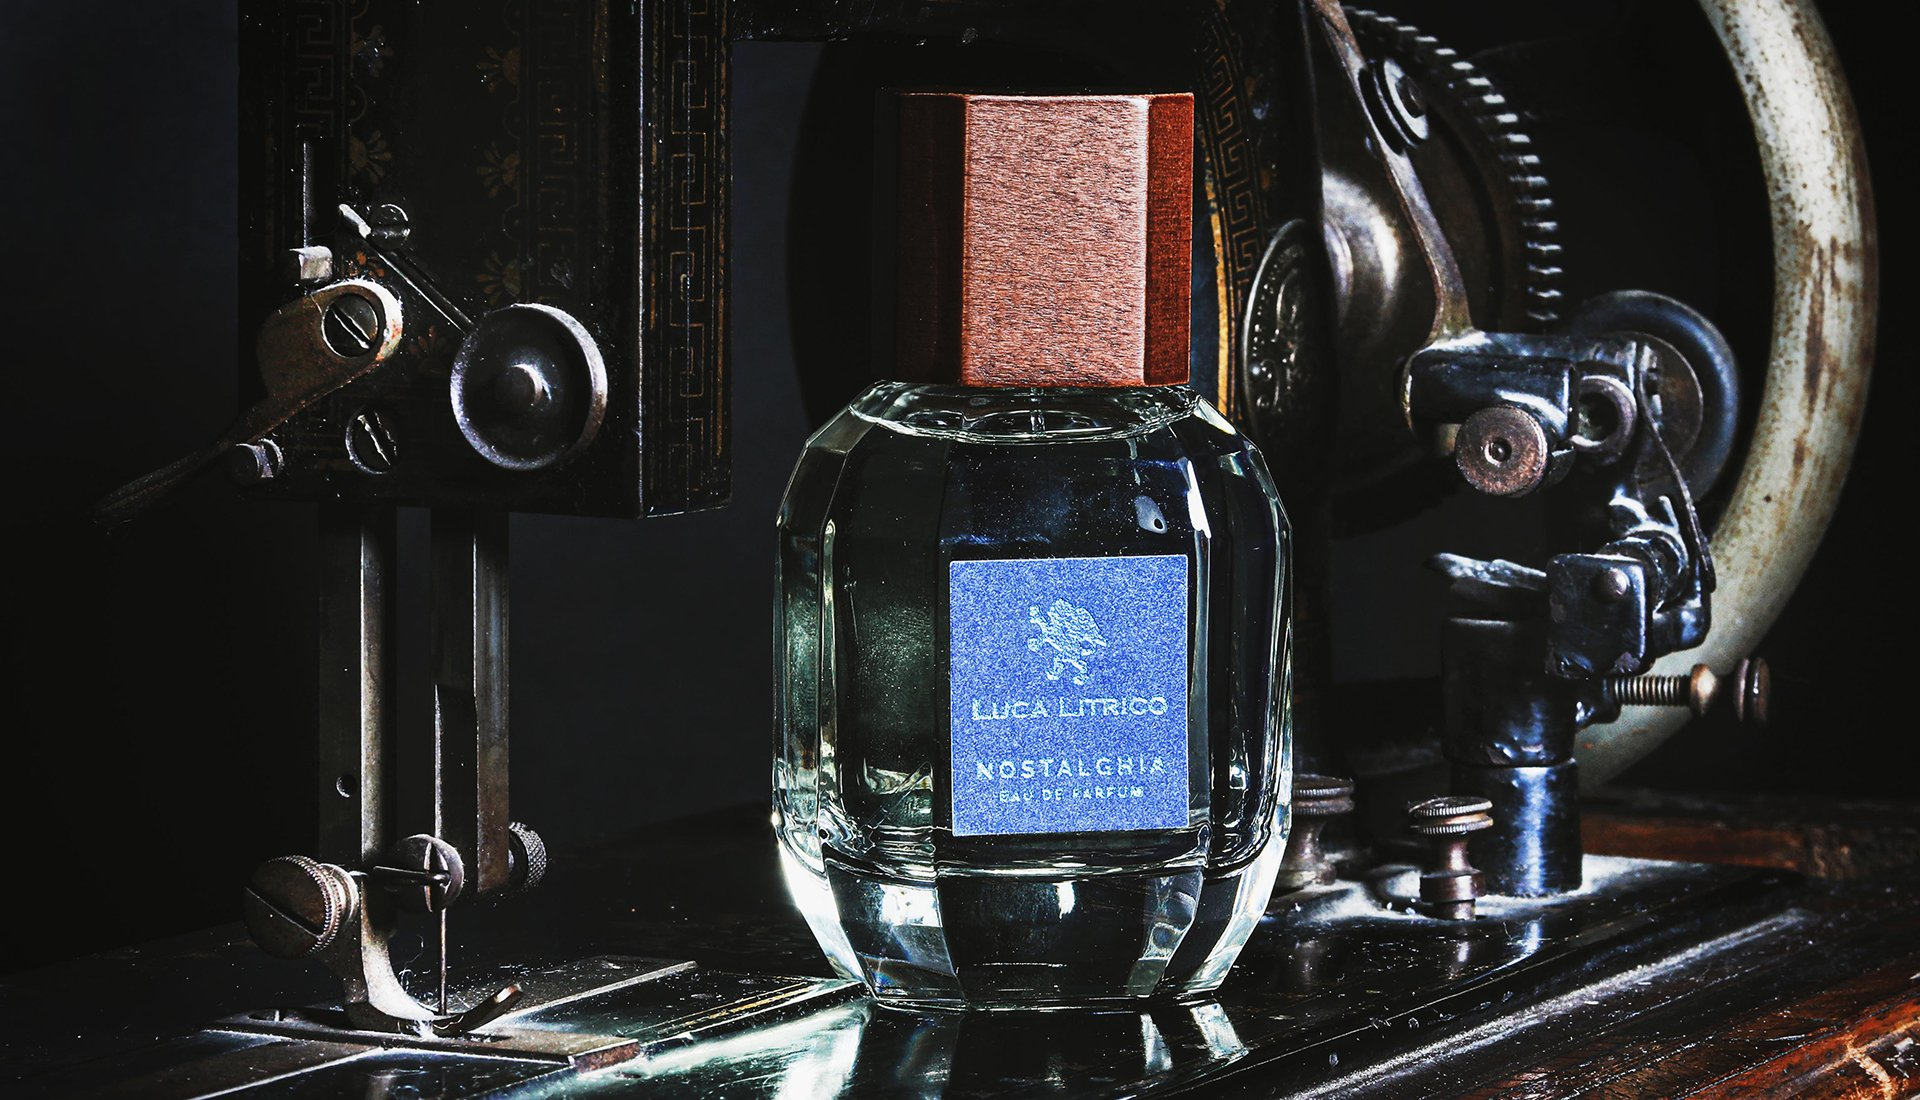 perfume - nostalghia - luca litrico